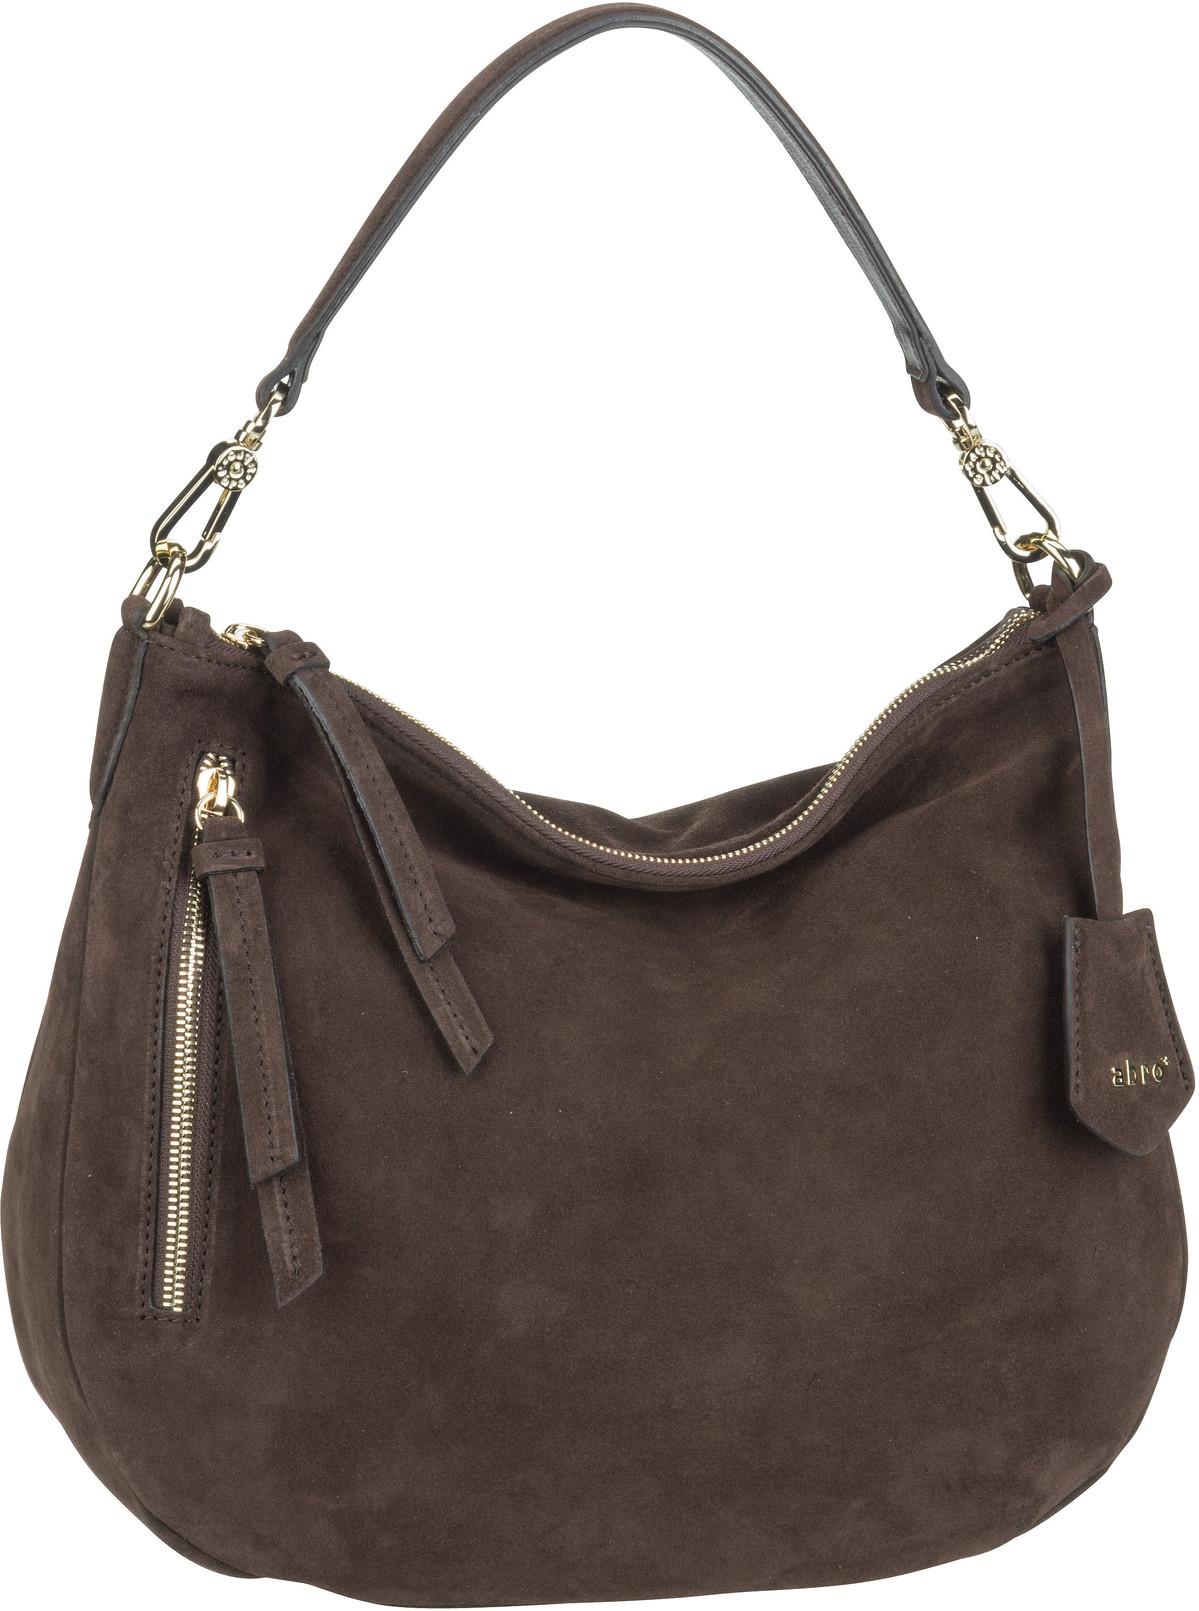 Handtasche Juna 28825 Suede Dark Brown